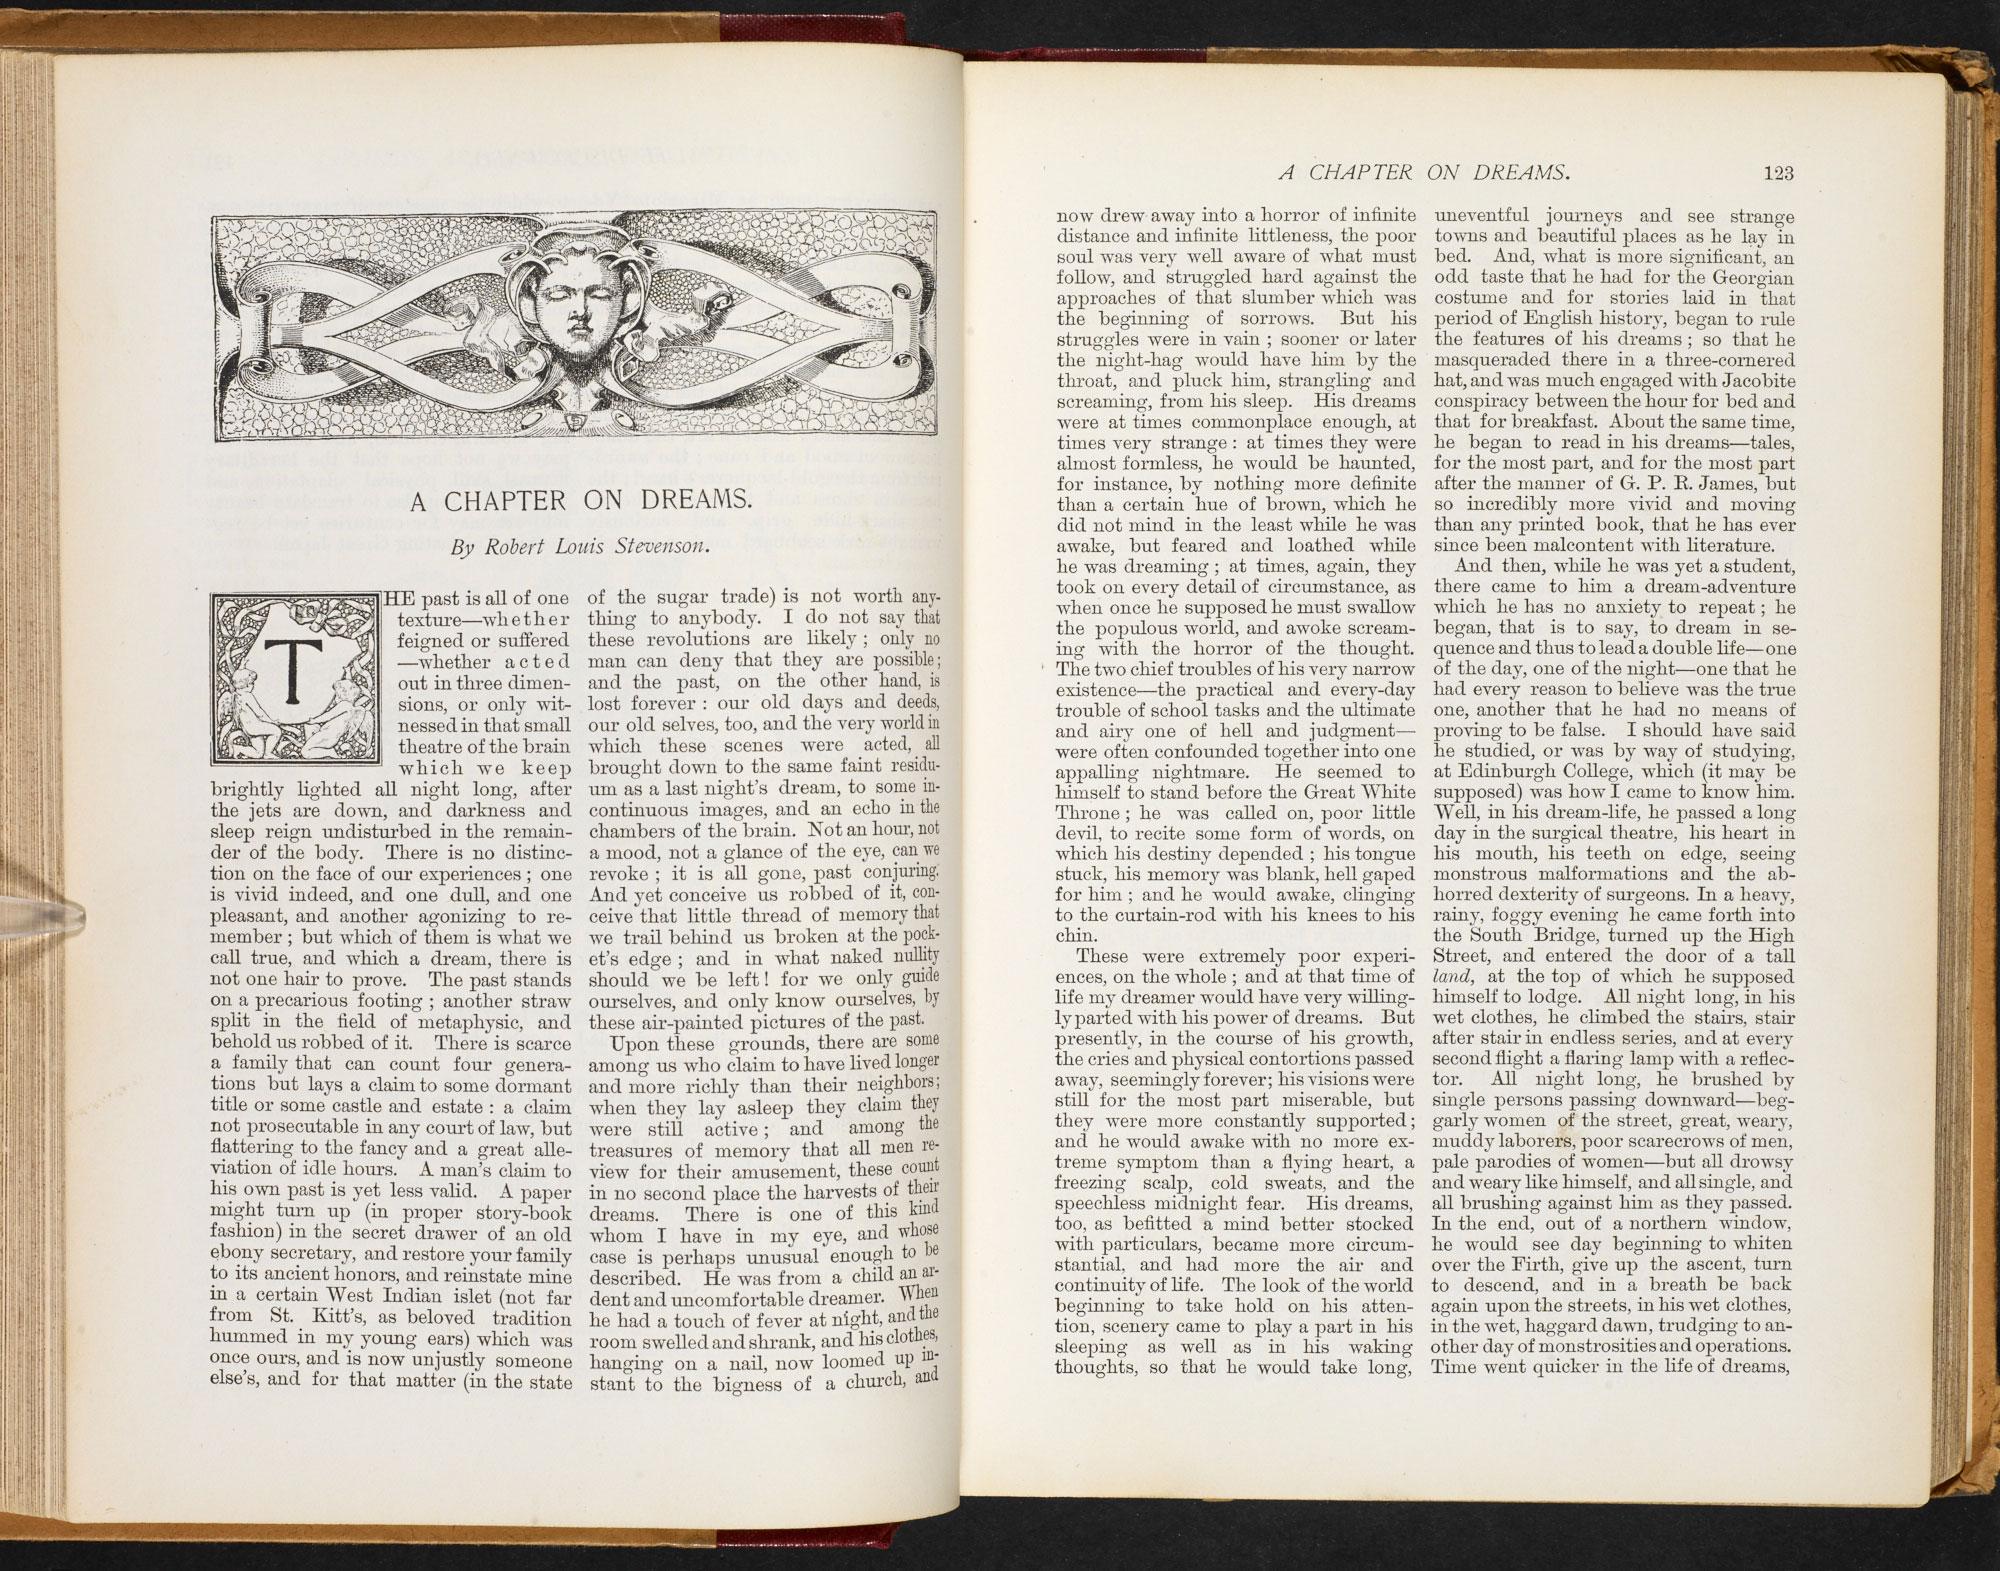 'A Chapter on Dreams' by Robert Louis Stevenson